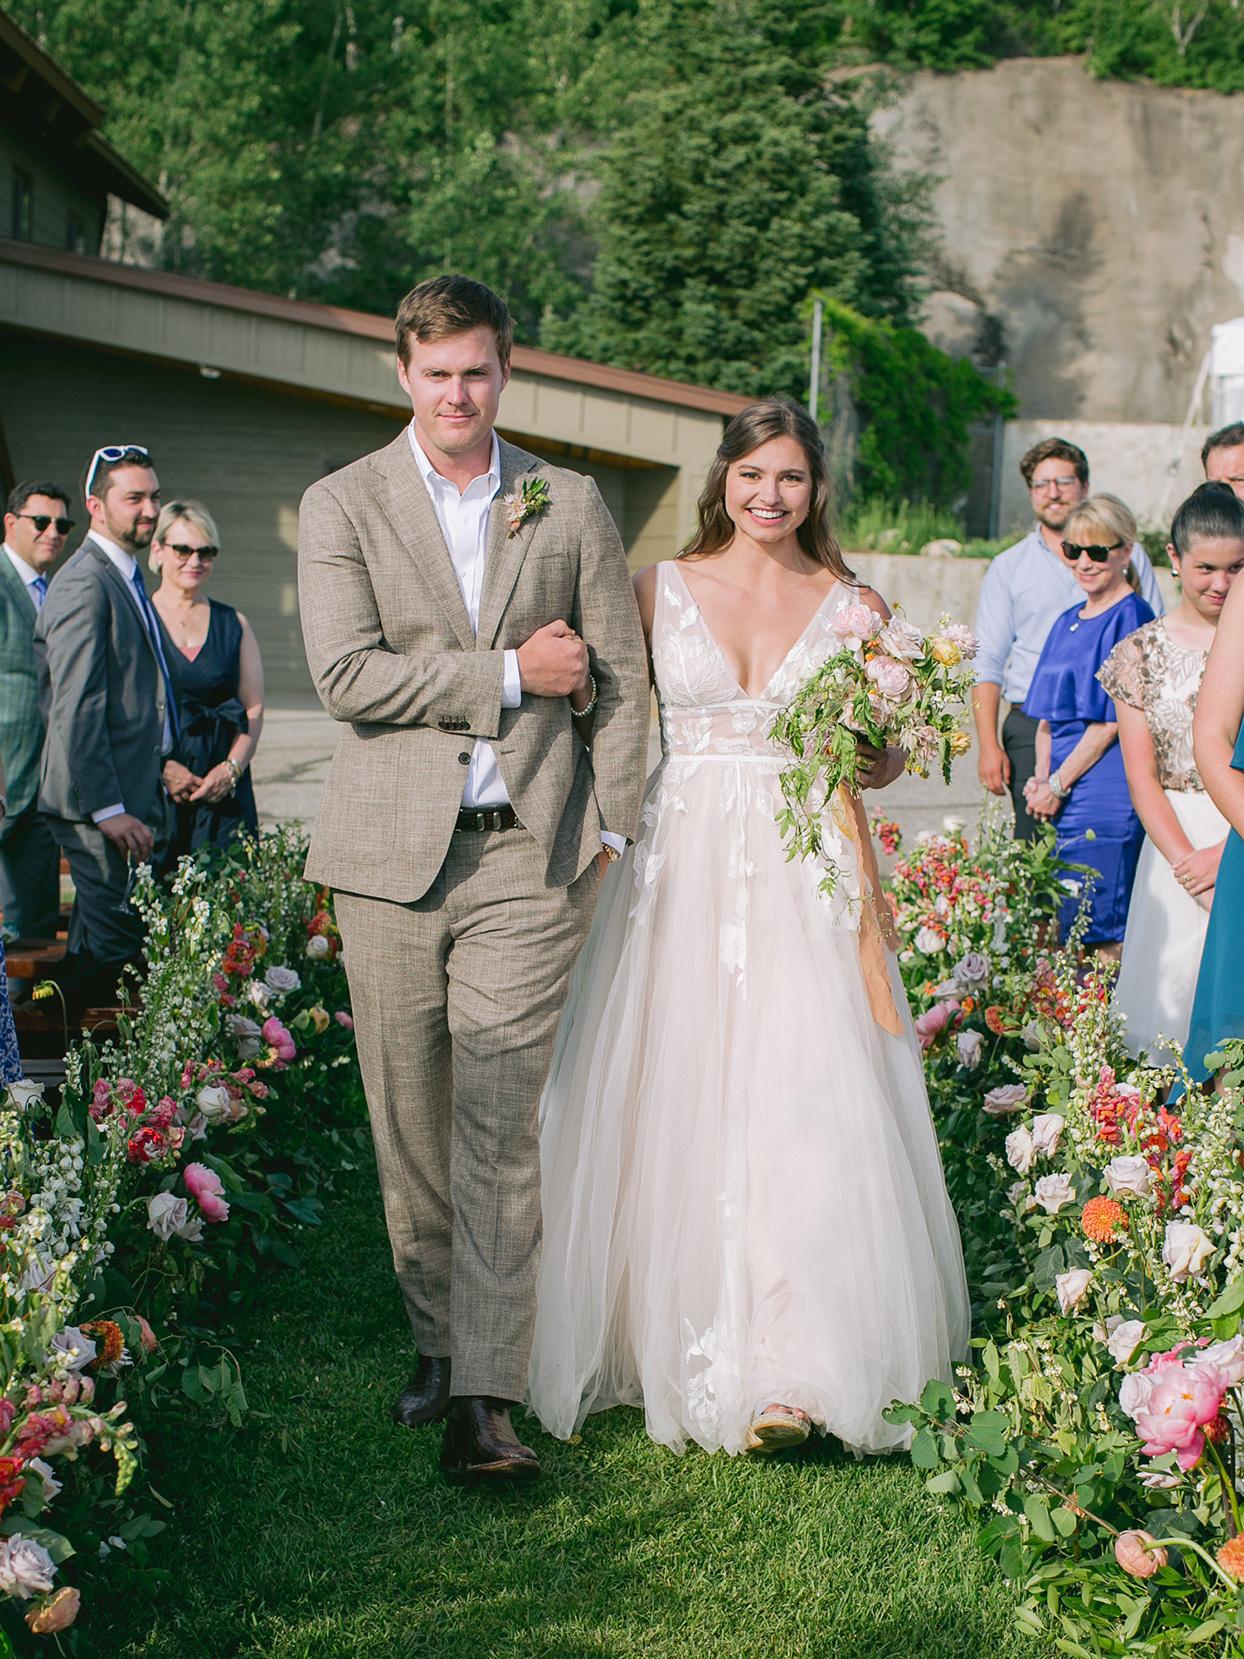 logan conor wedding ceremony processional couple